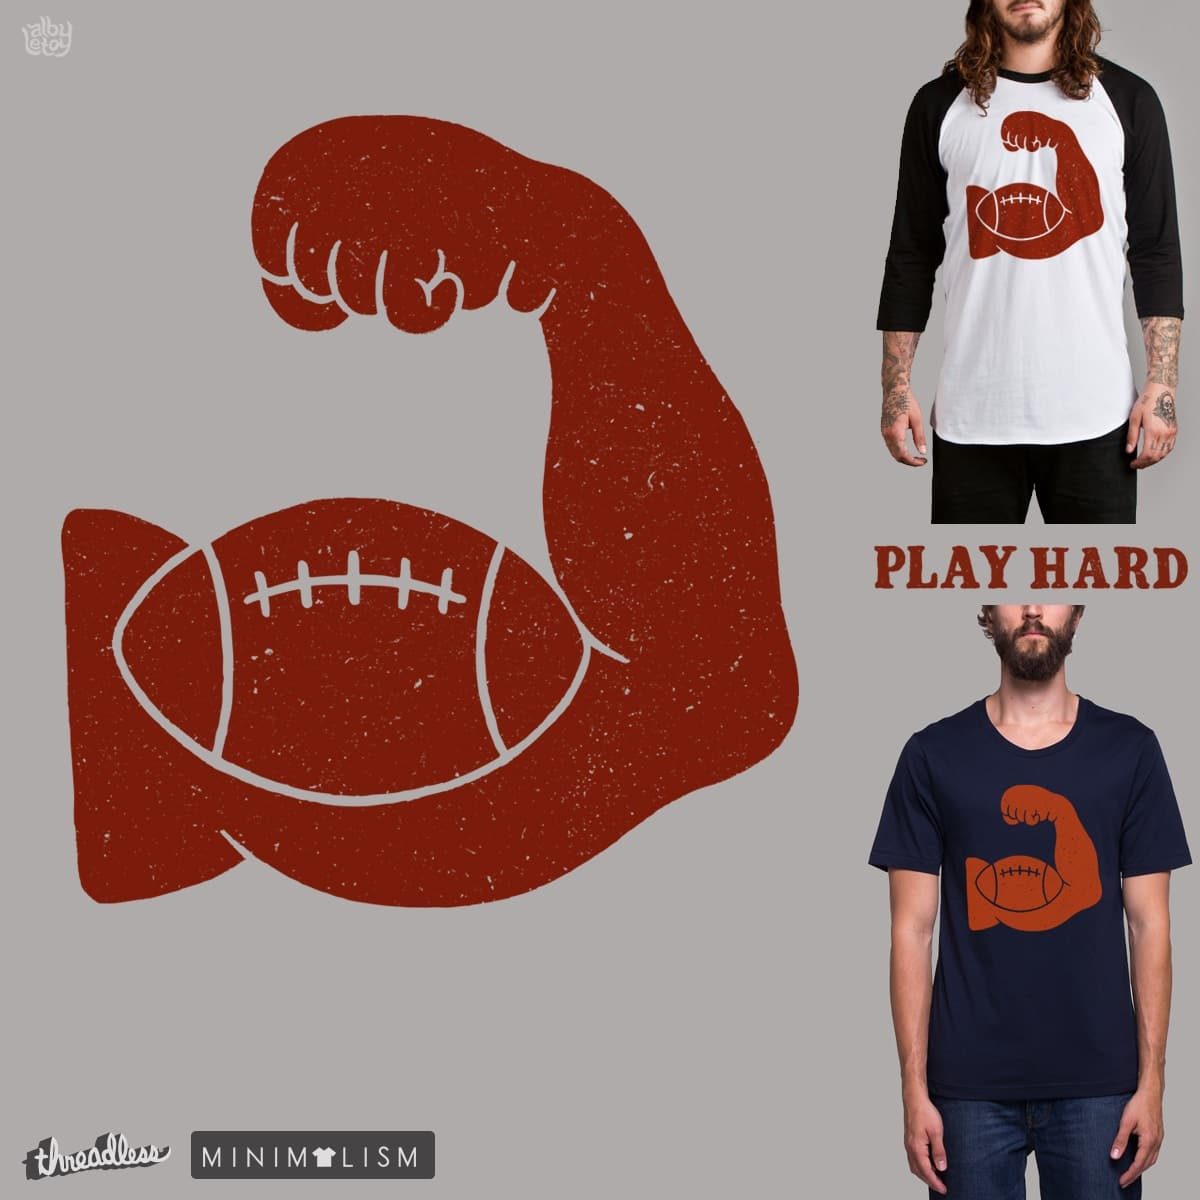 PLAY HARD by albyletoy on Threadless